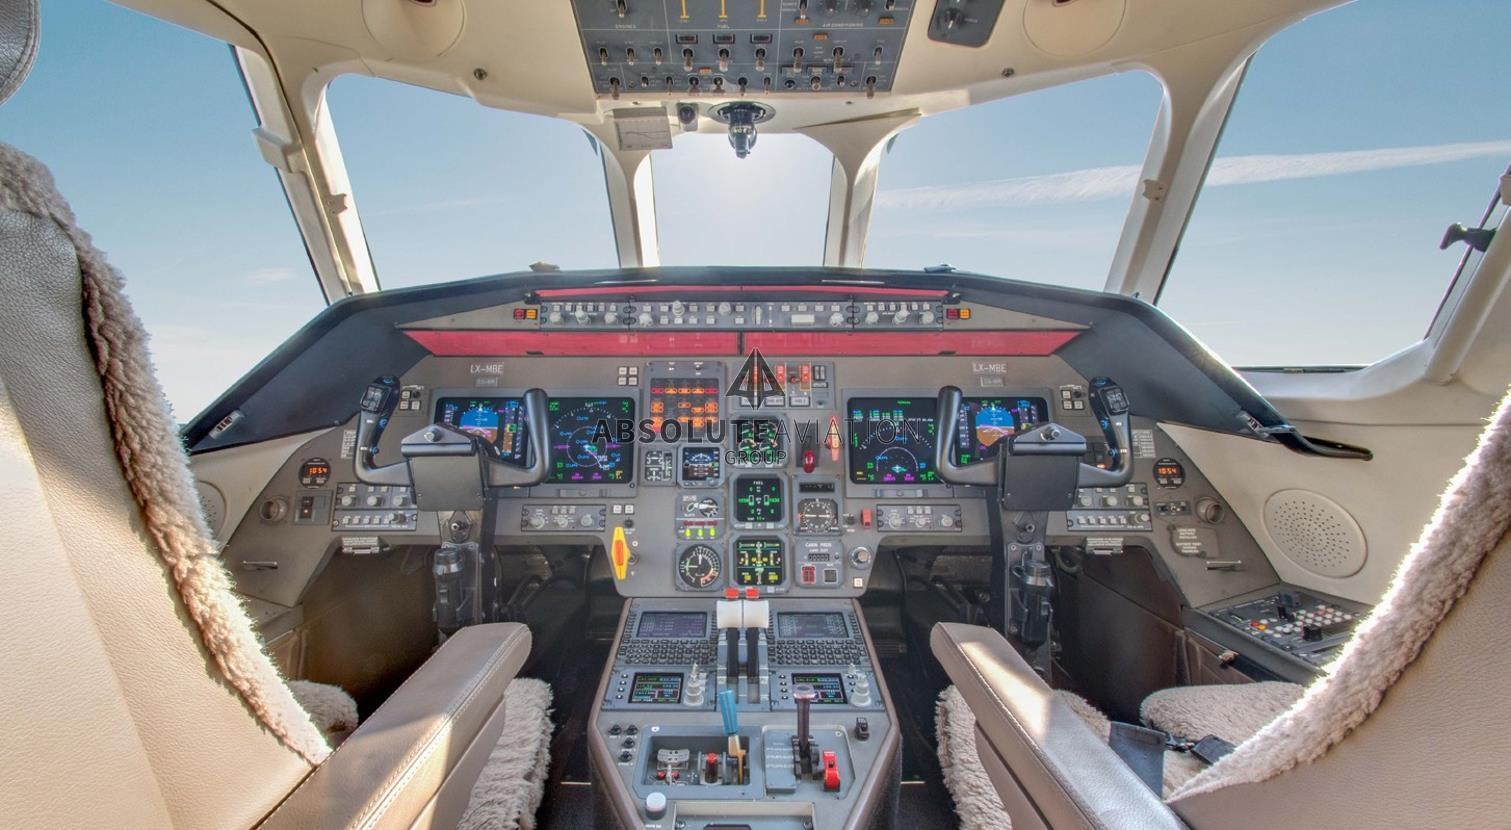 2004 DASSAULT FALCON 2000 for sale_avionics